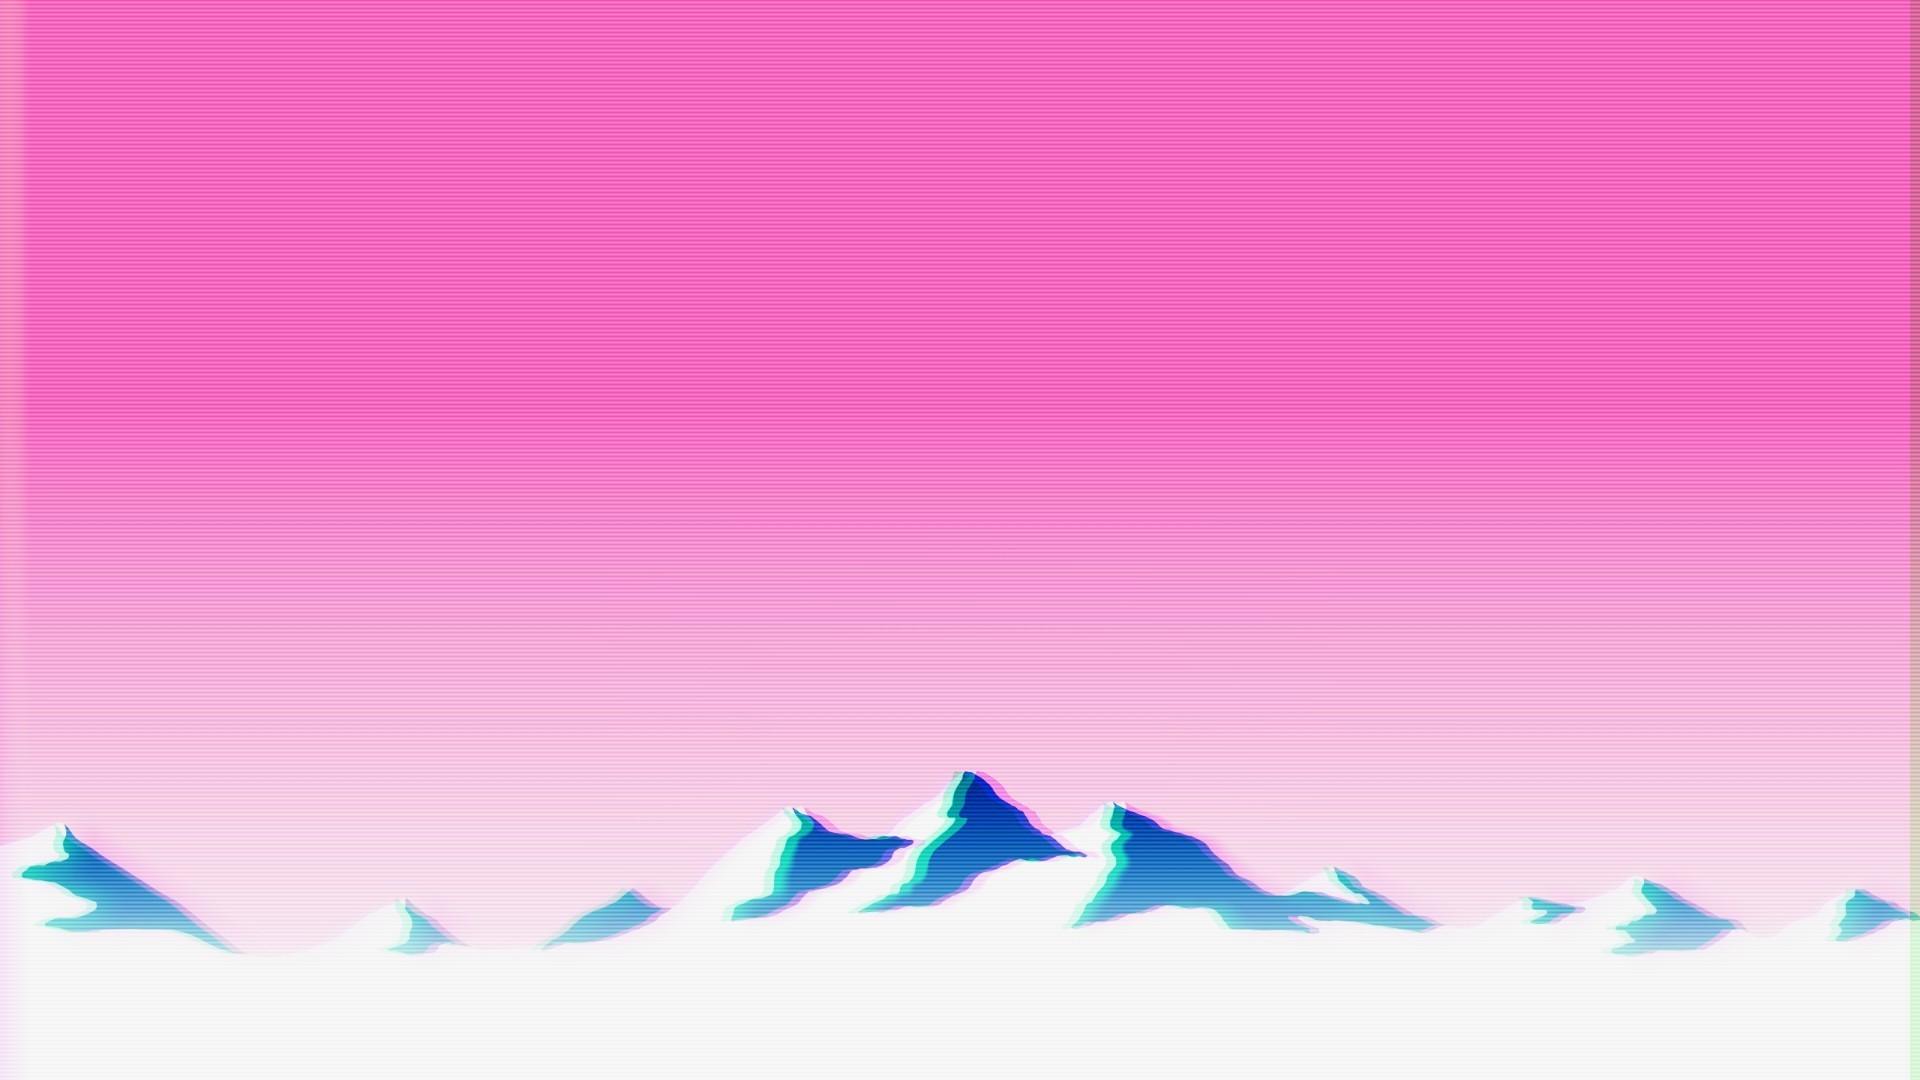 Zelda Iphone Wallpaper Vaporwave Background 183 ① Download Free Stunning High